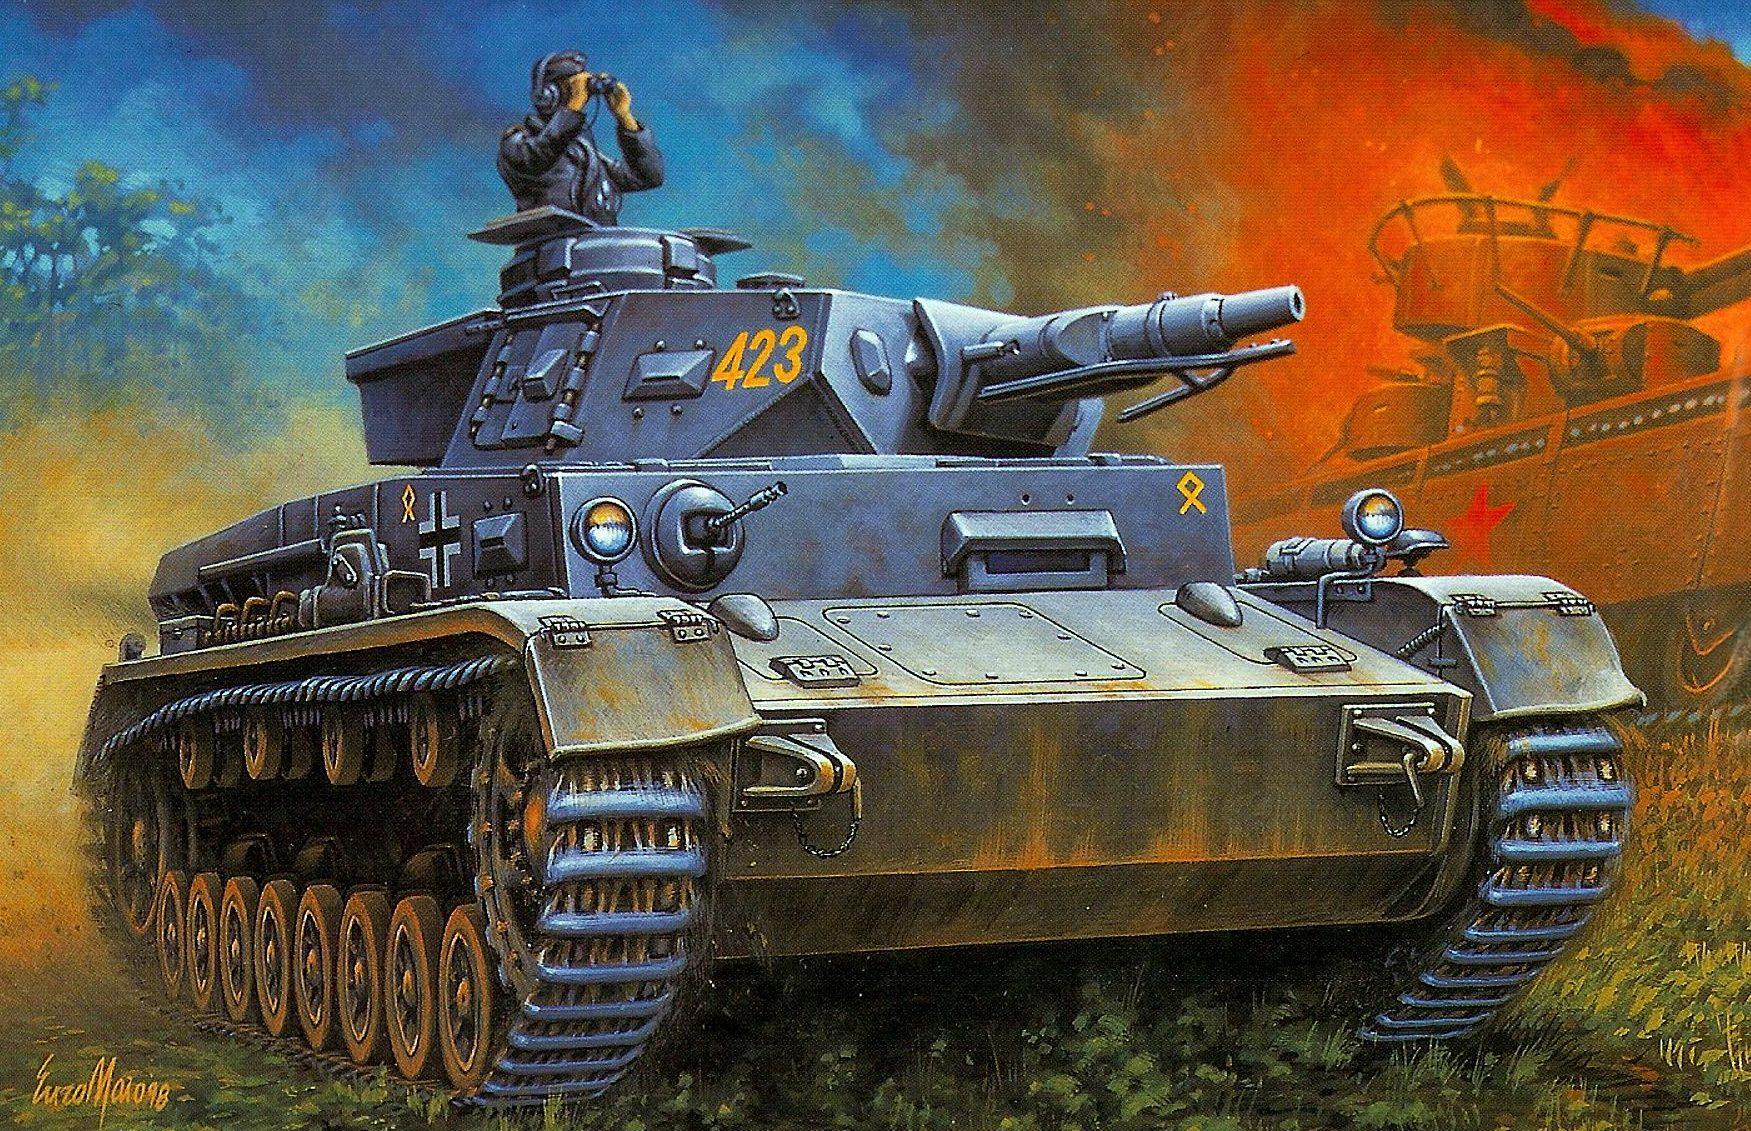 Maio Enzo. Танк Pz.Kpfw. IV Ausf. F1.